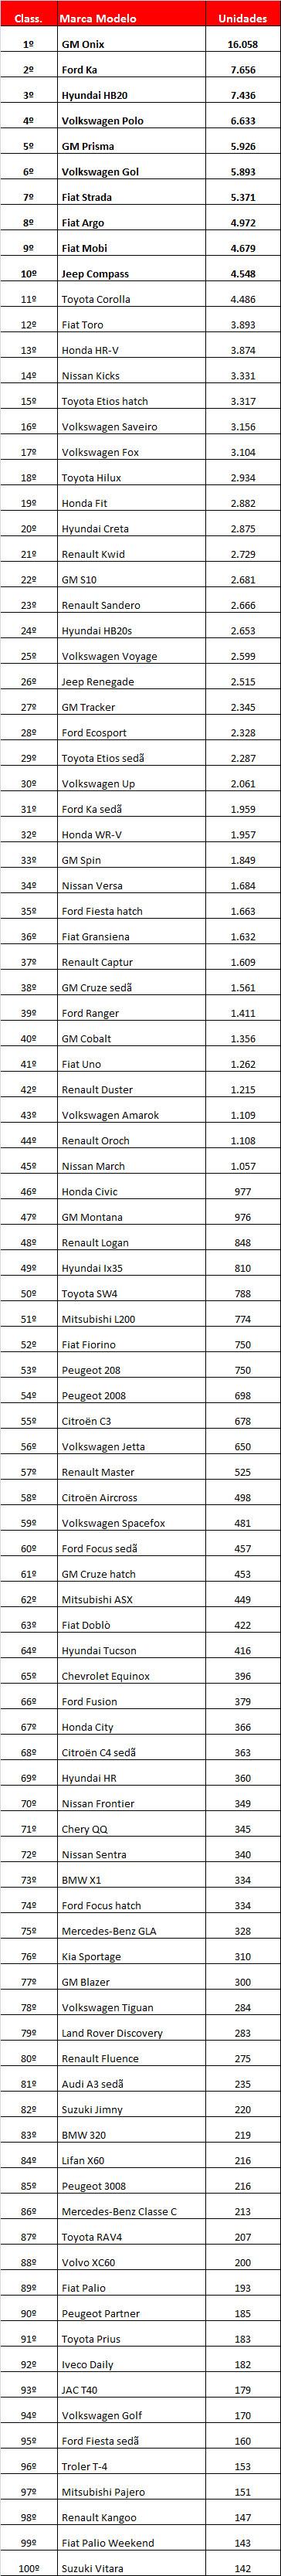 Ranking por modelo_JAN2018